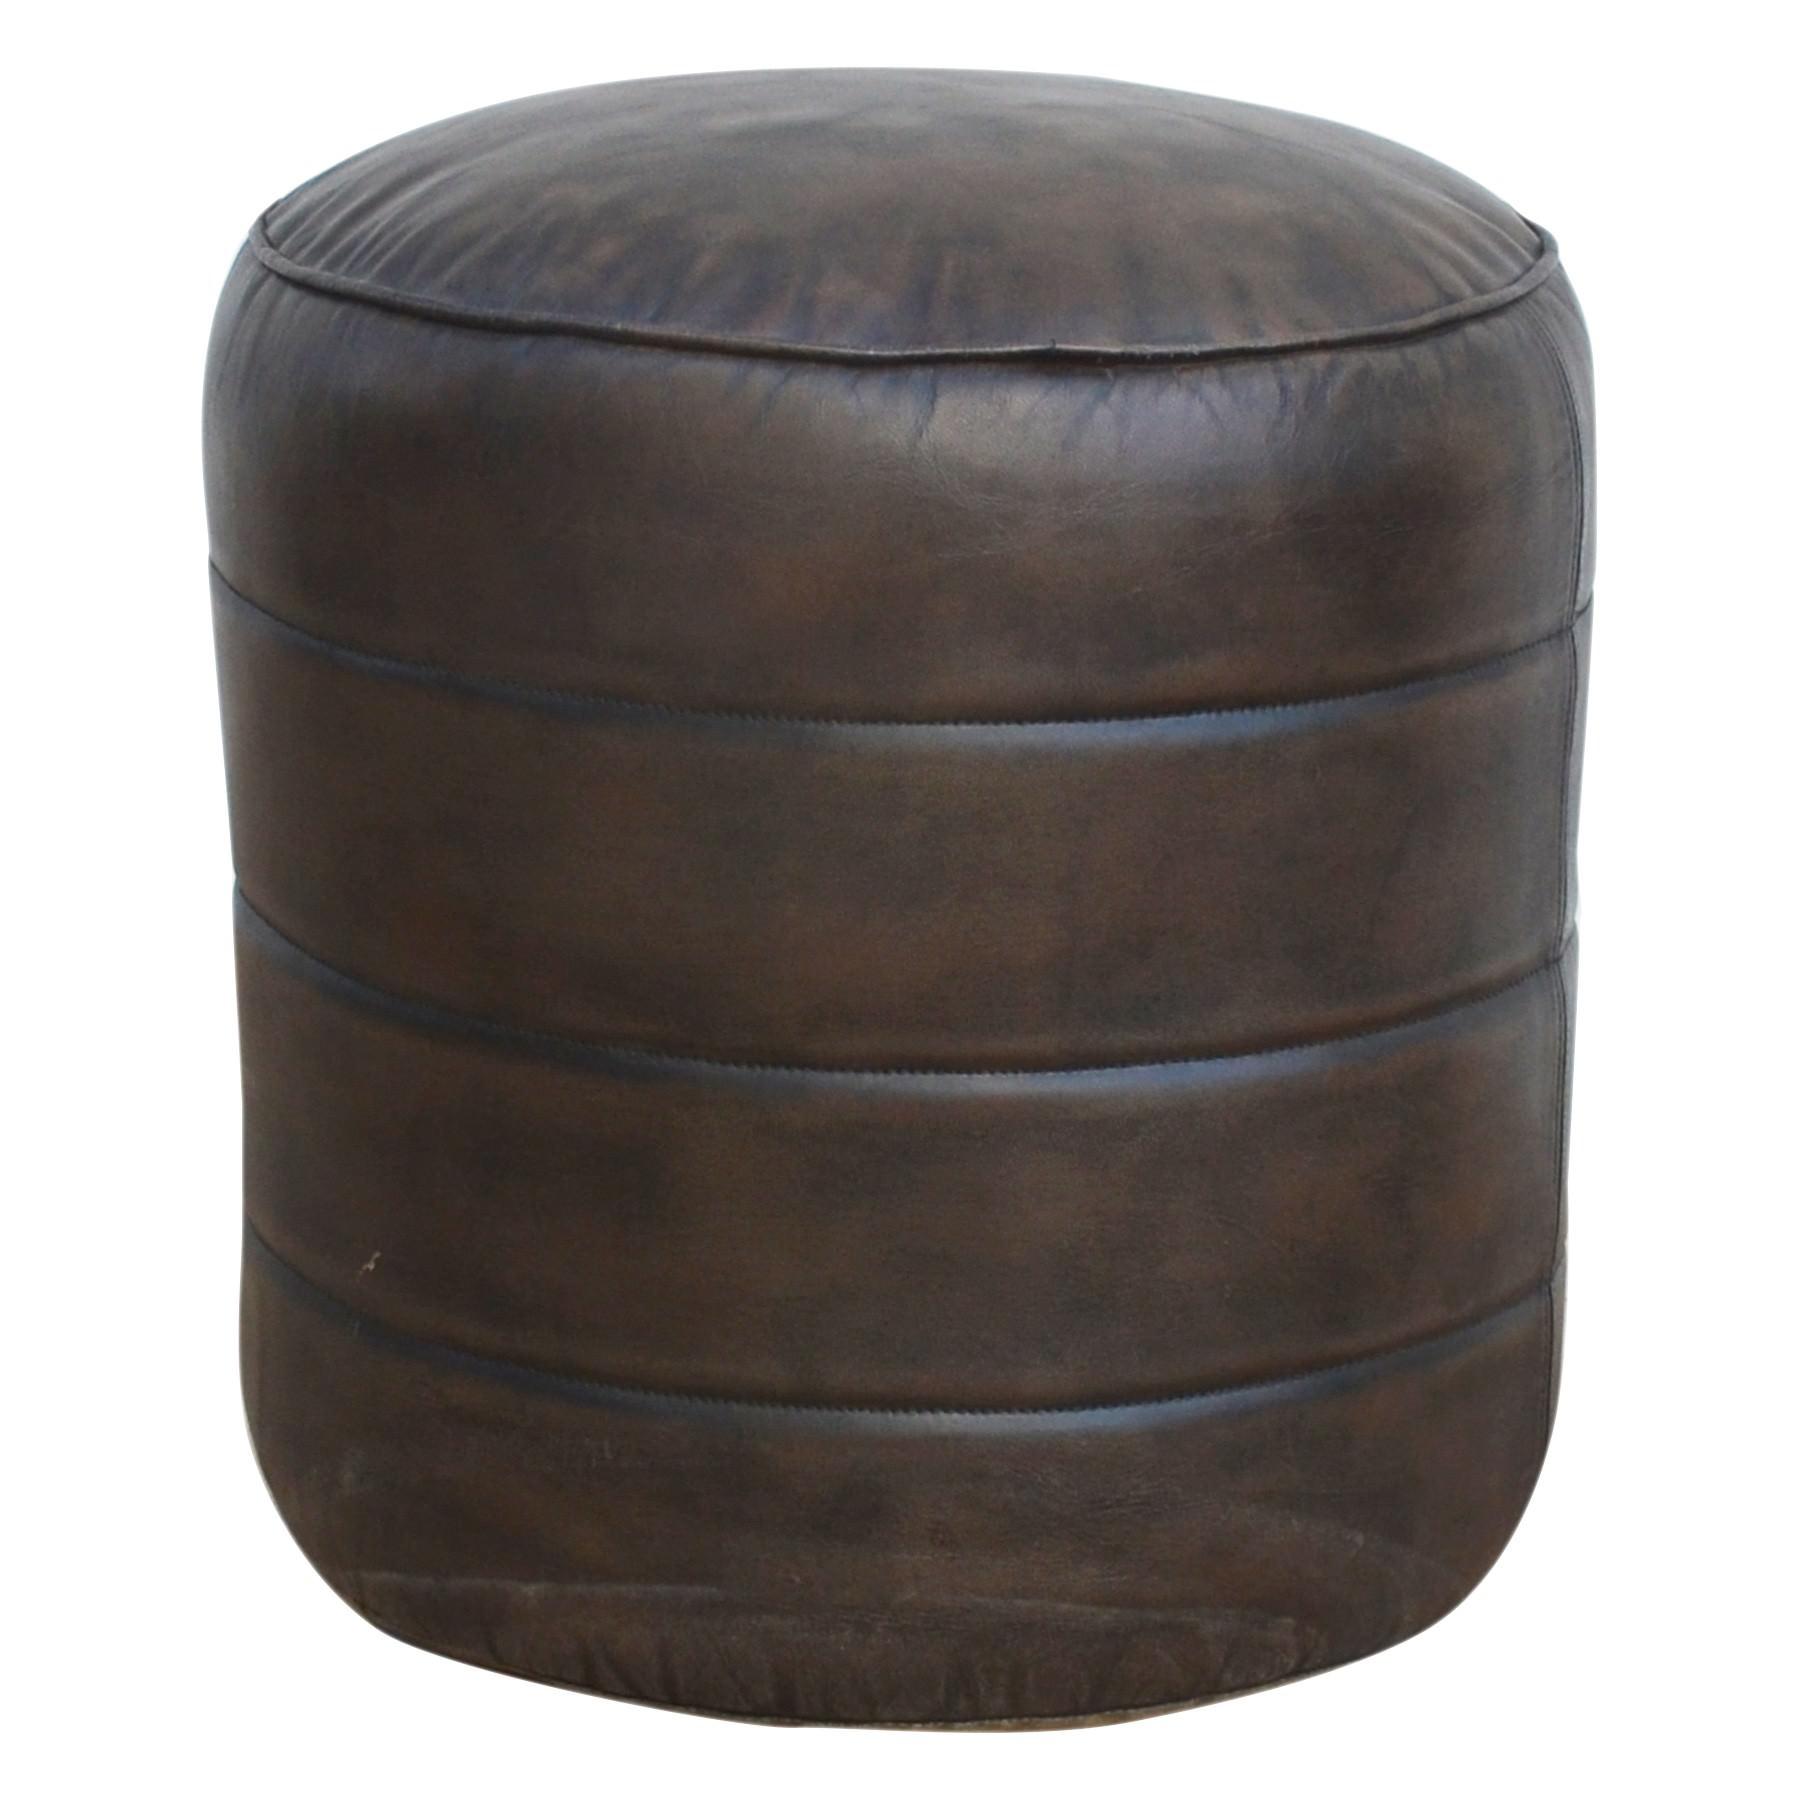 Bellhouse Vintage Leather Ottoman, Round